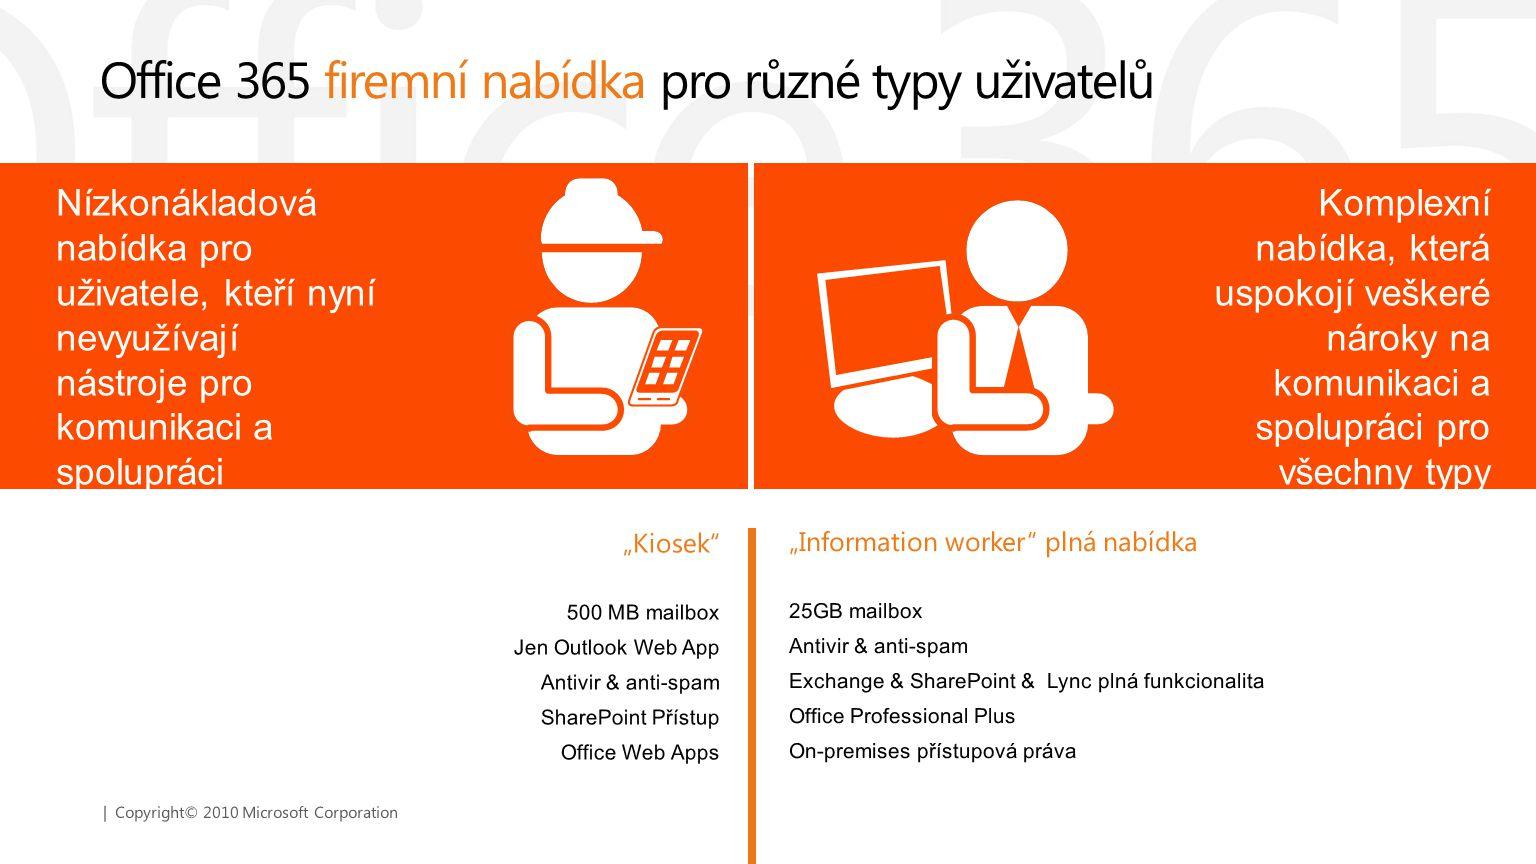 "| Copyright© 2010 Microsoft Corporation ""Kiosek"" 500 MB mailbox Jen Outlook Web App Antivir & anti-spam SharePoint Přístup Office Web Apps Office 365"